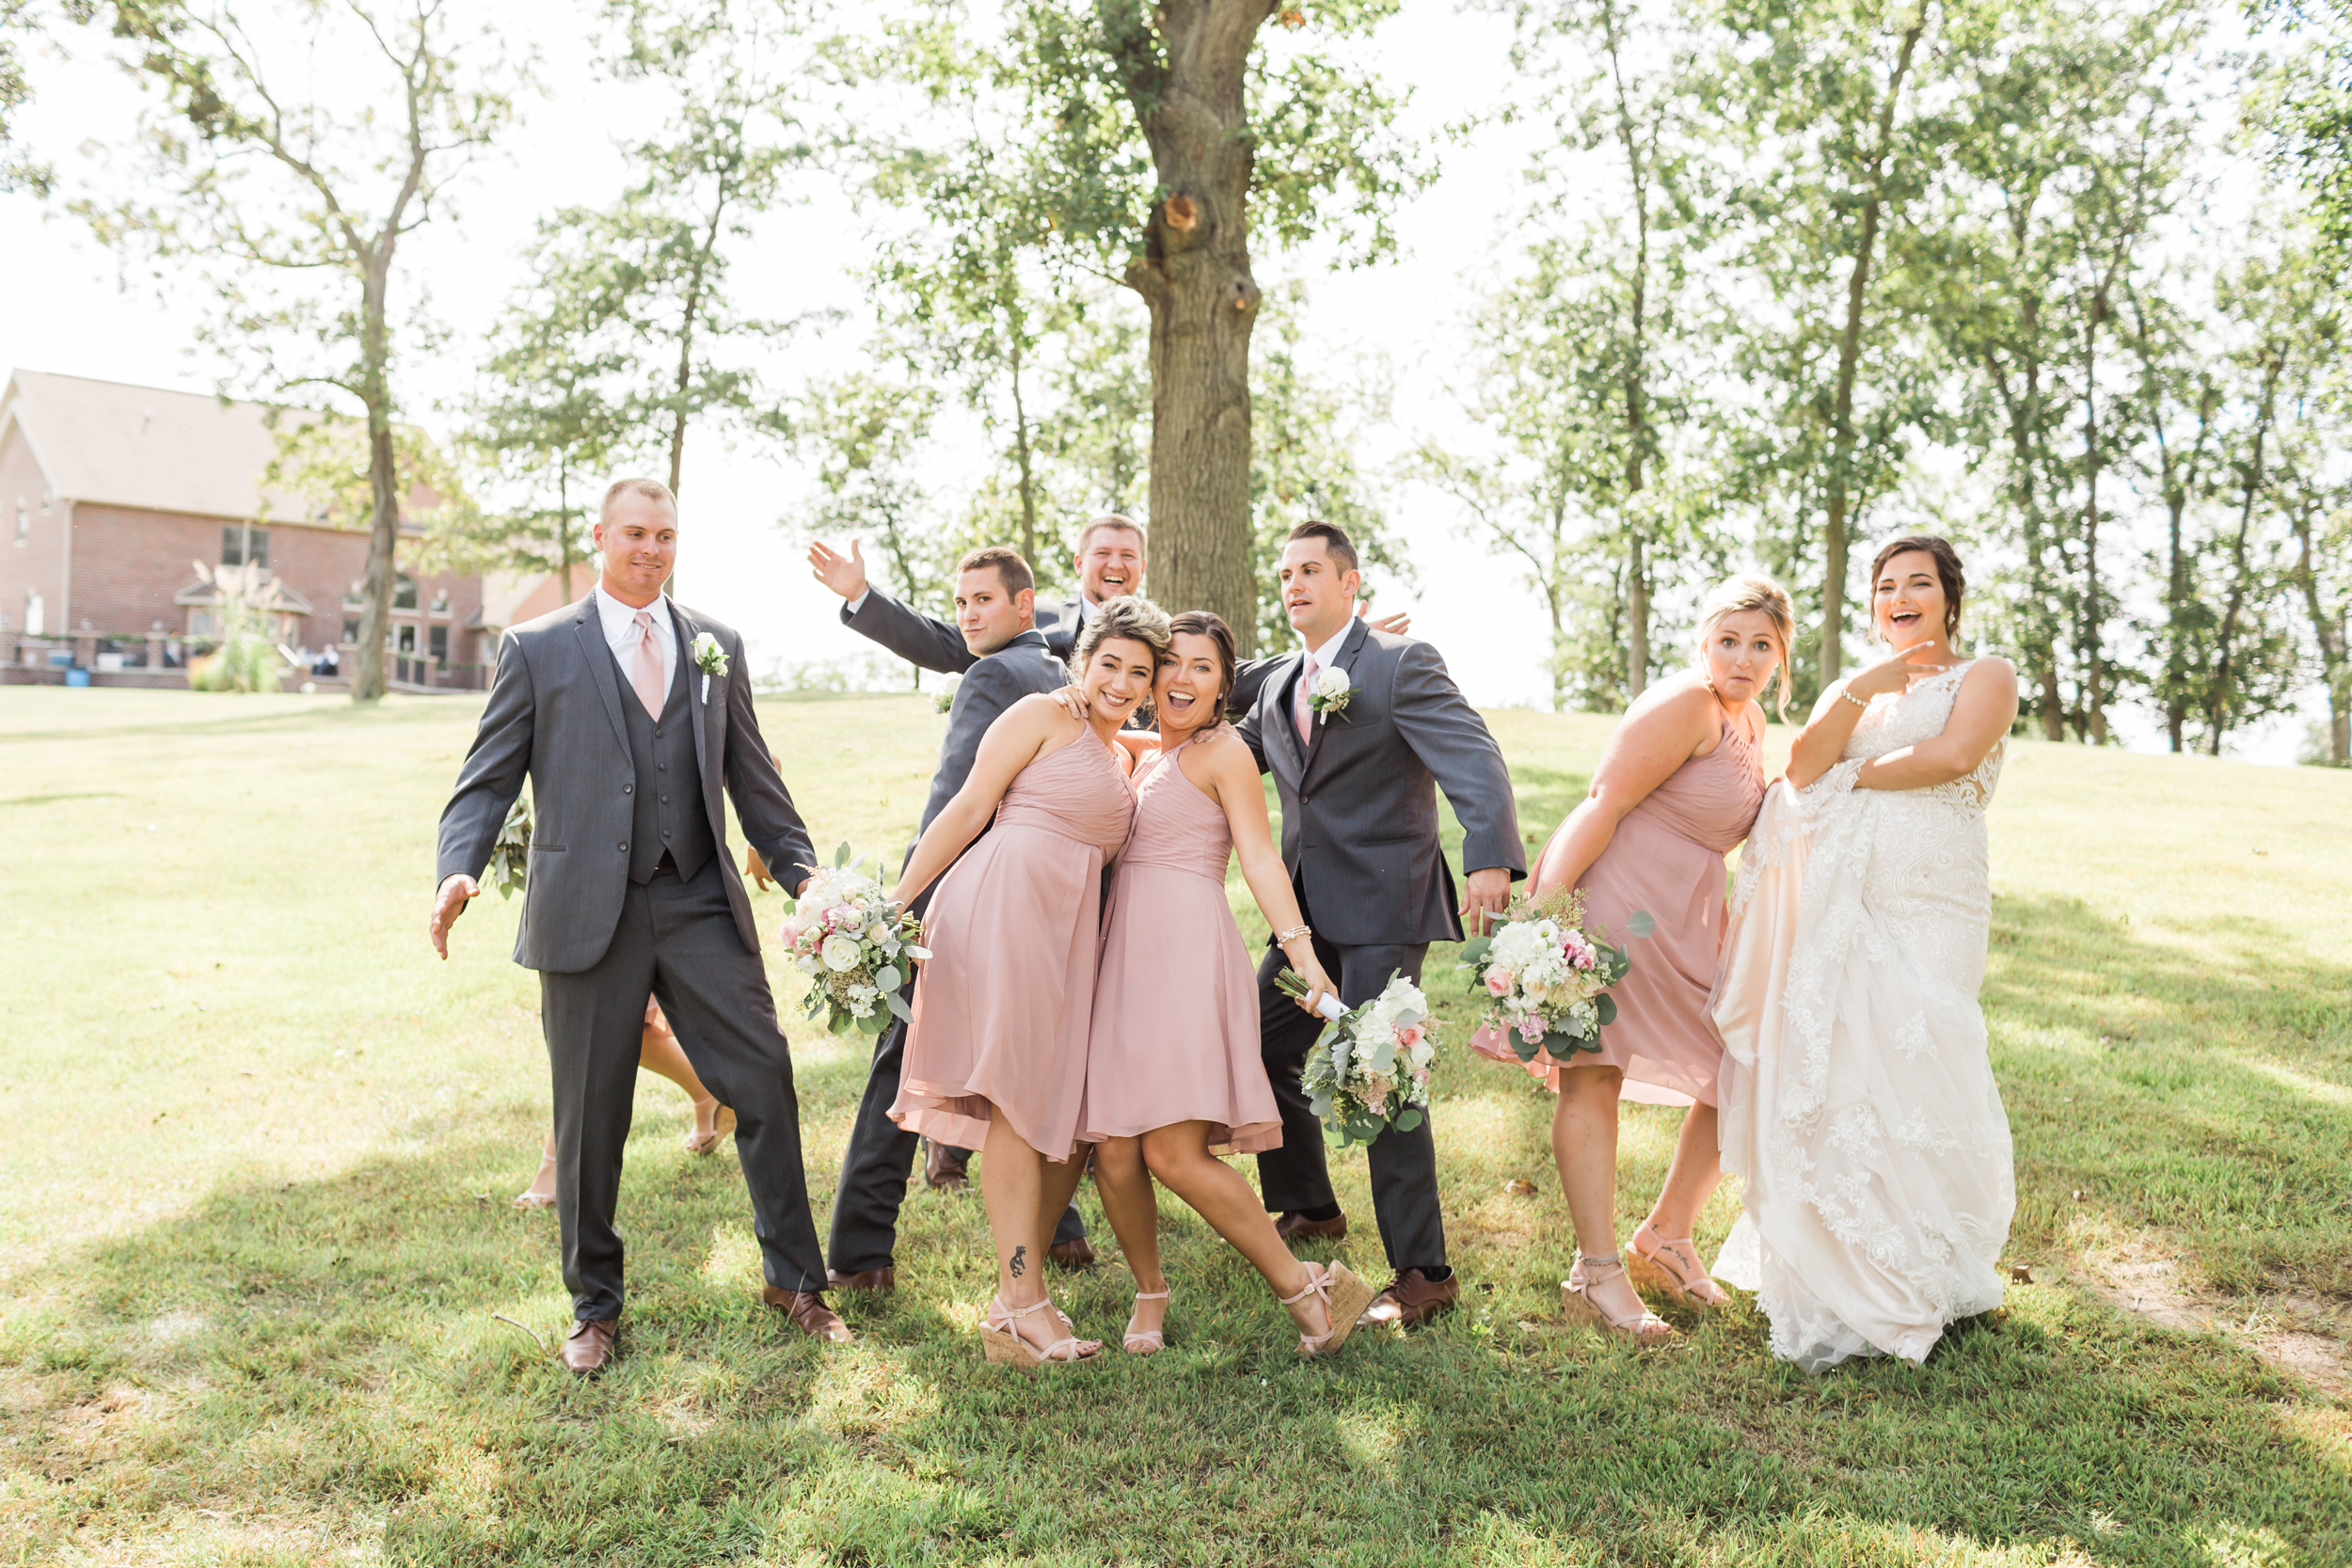 romanticcountrywedding--44.jpg